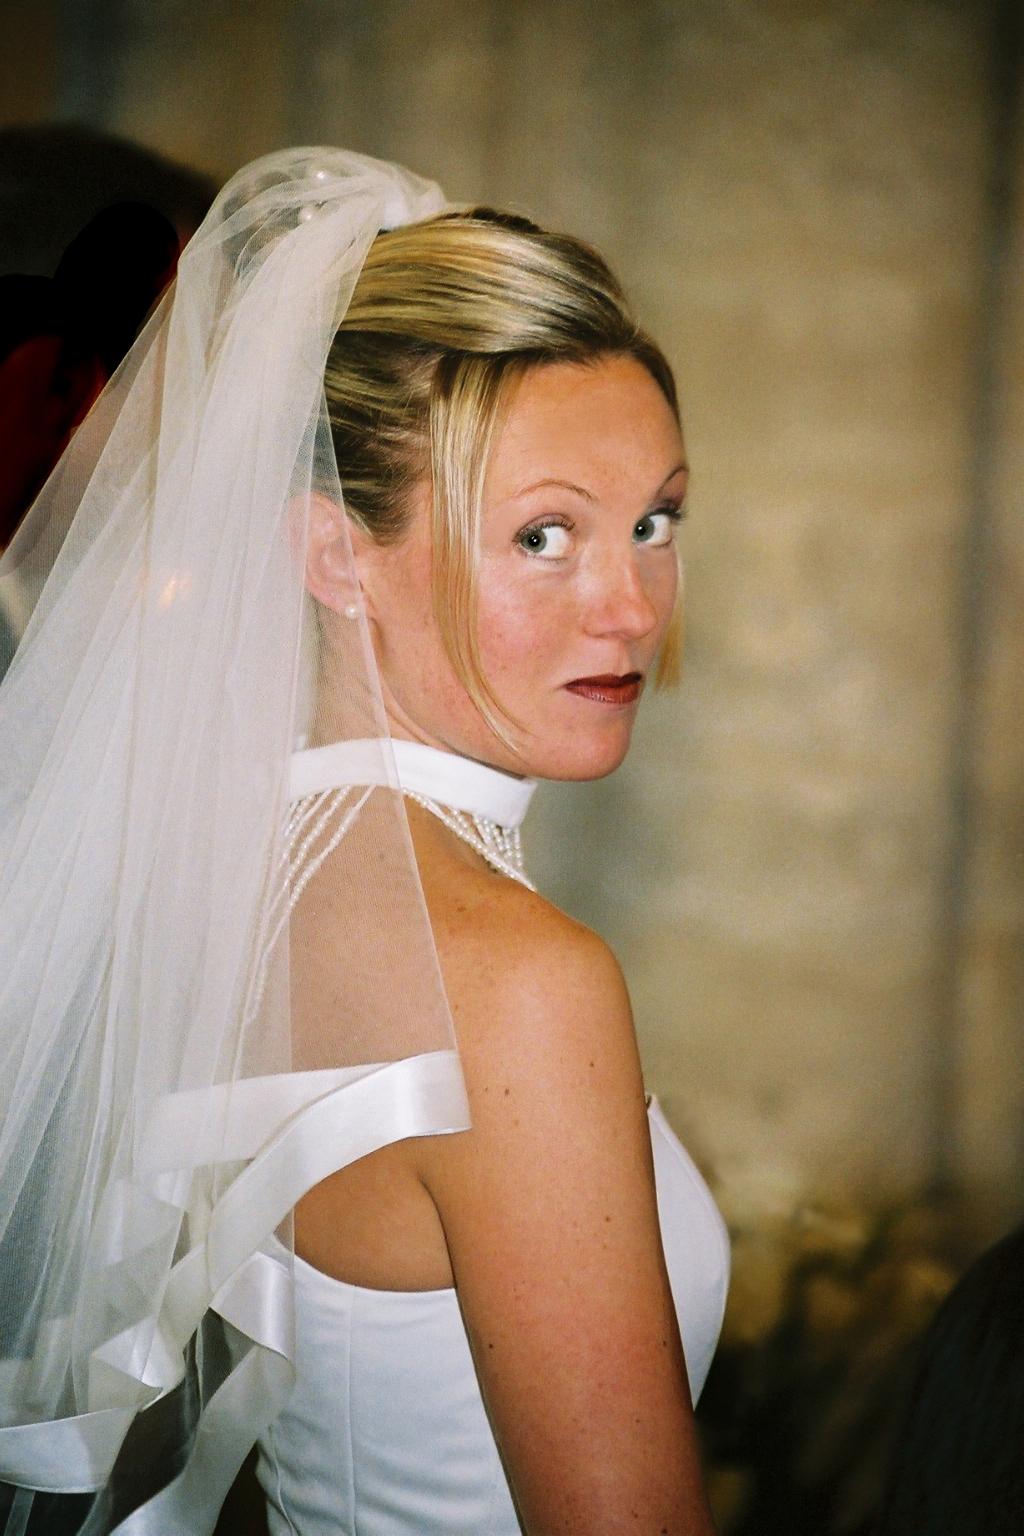 mariage la mariè